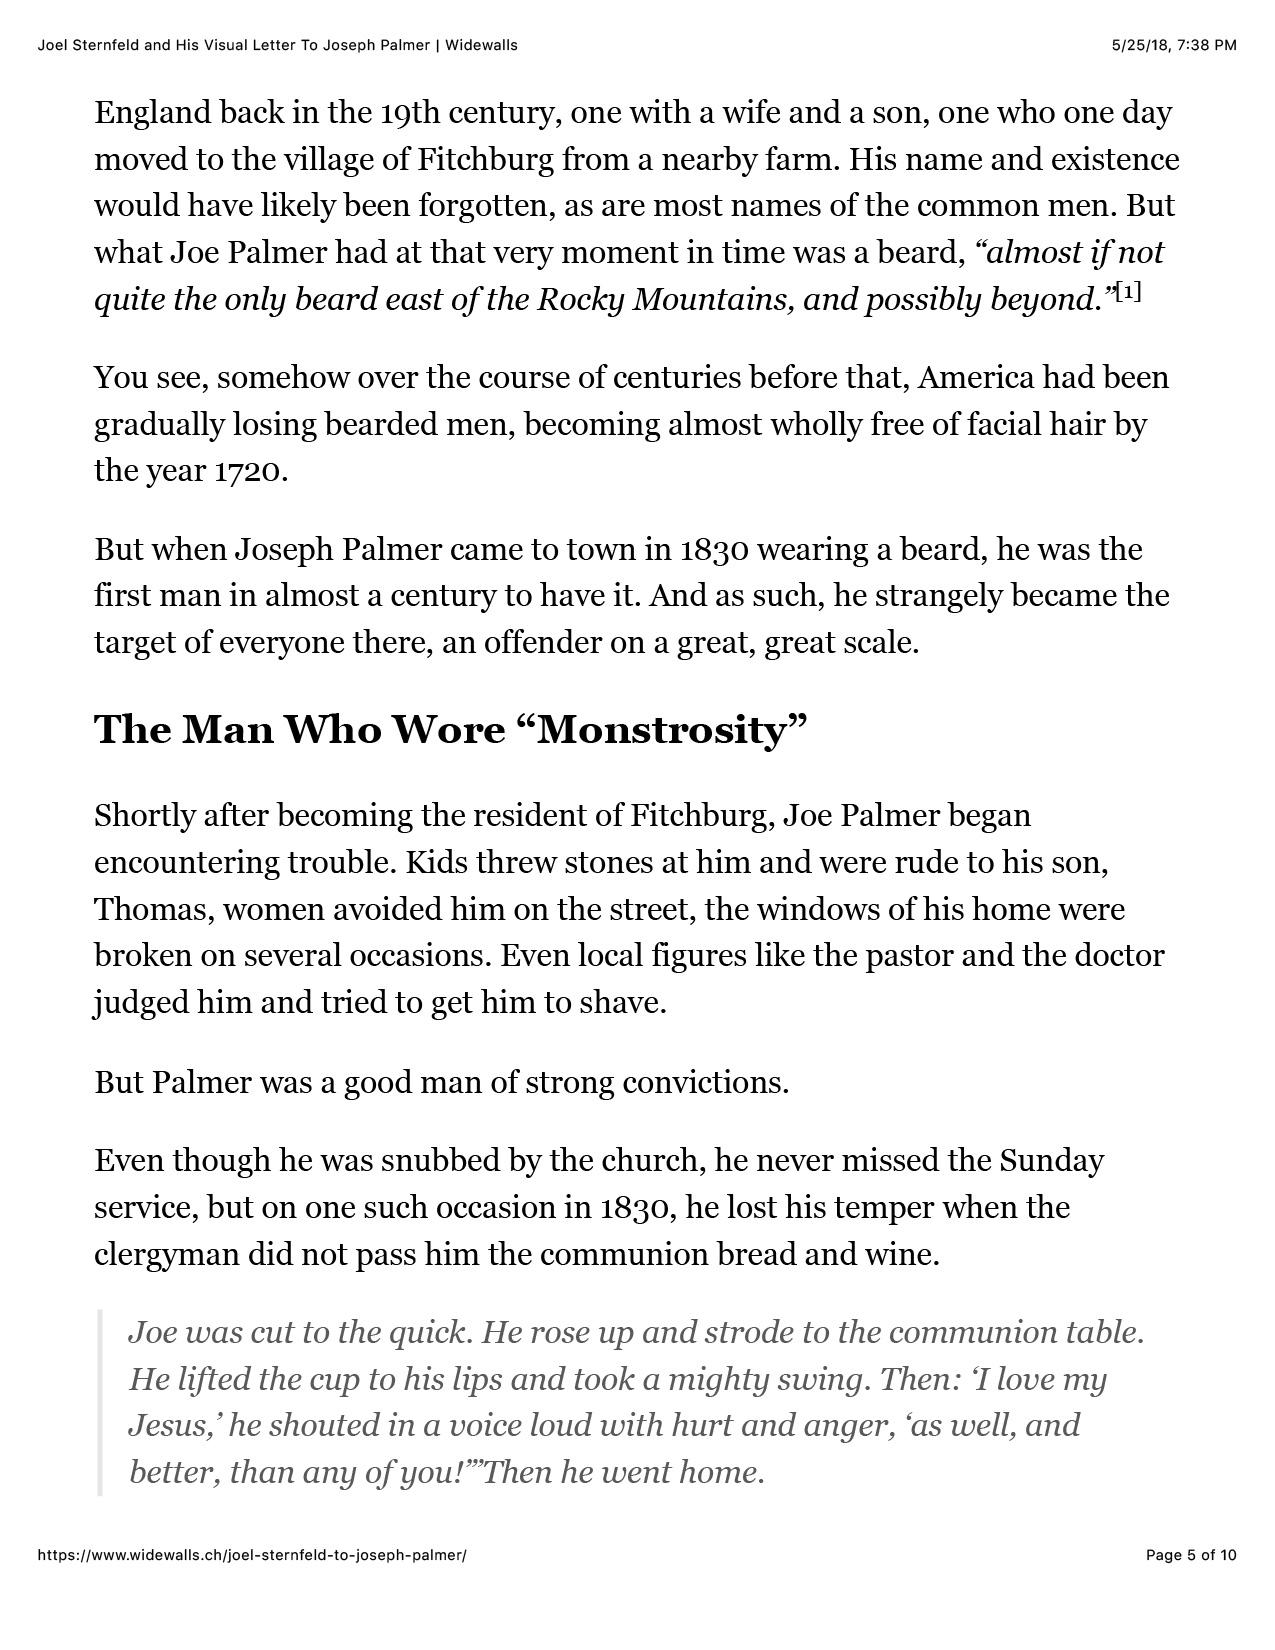 Joel-Sternfeld-and-His-Visual-Letter-To-Joseph-Palmer-_-Widewalls-5.jpg